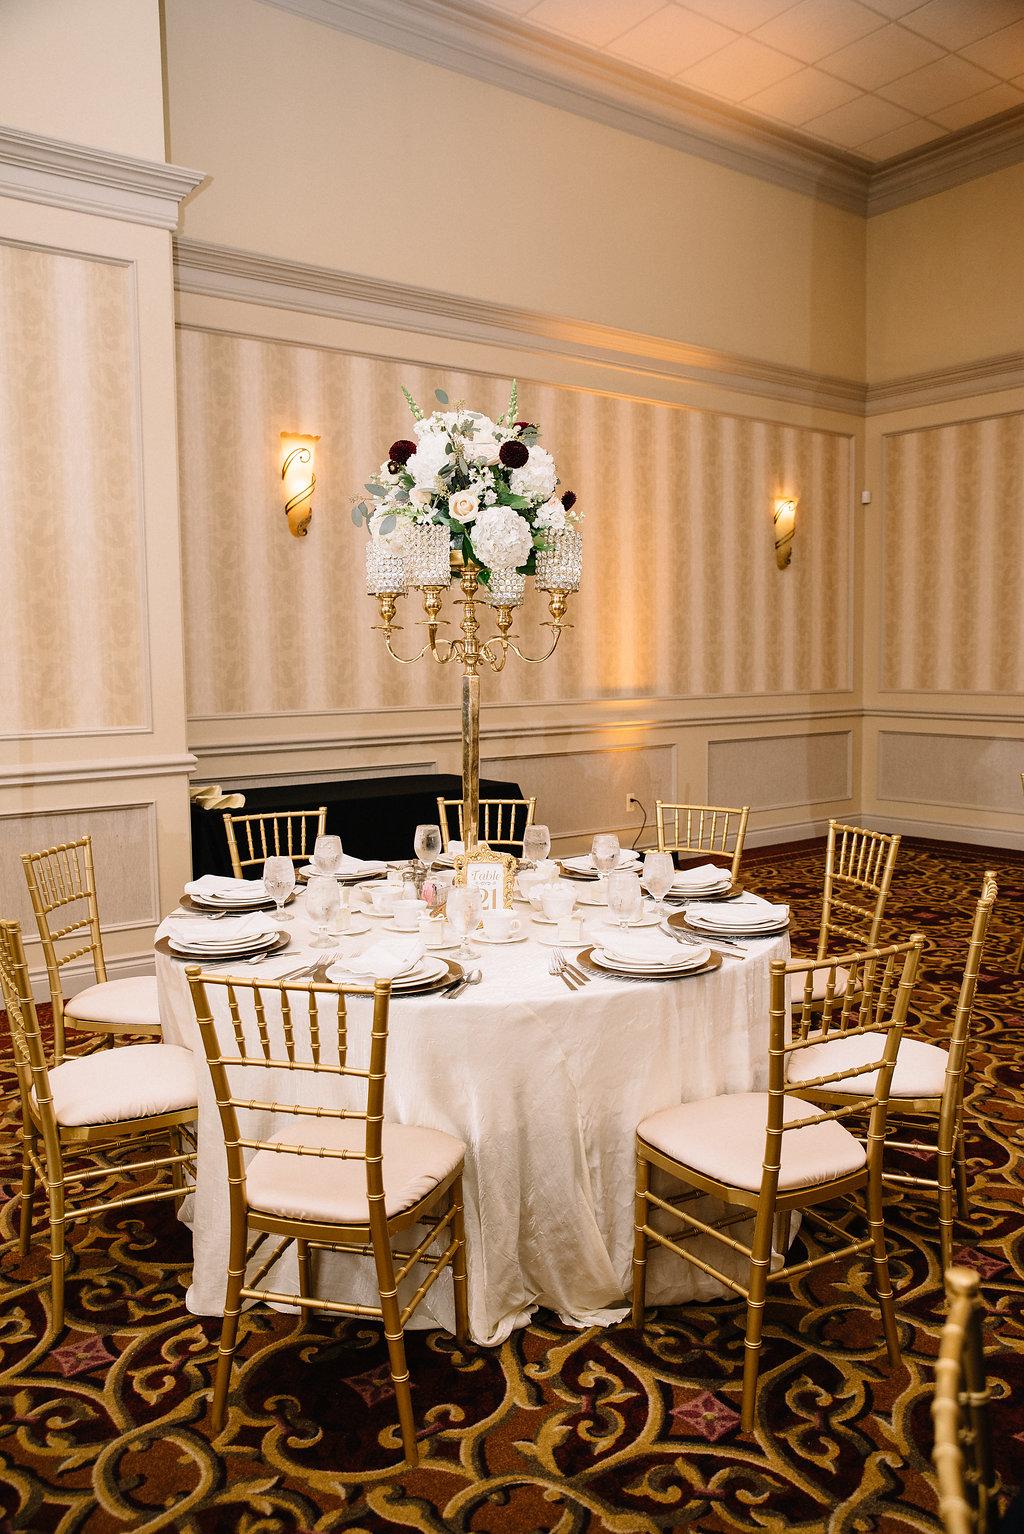 Palazzo_Grande_Shelby_Township_Wedding_Photos-858.jpg